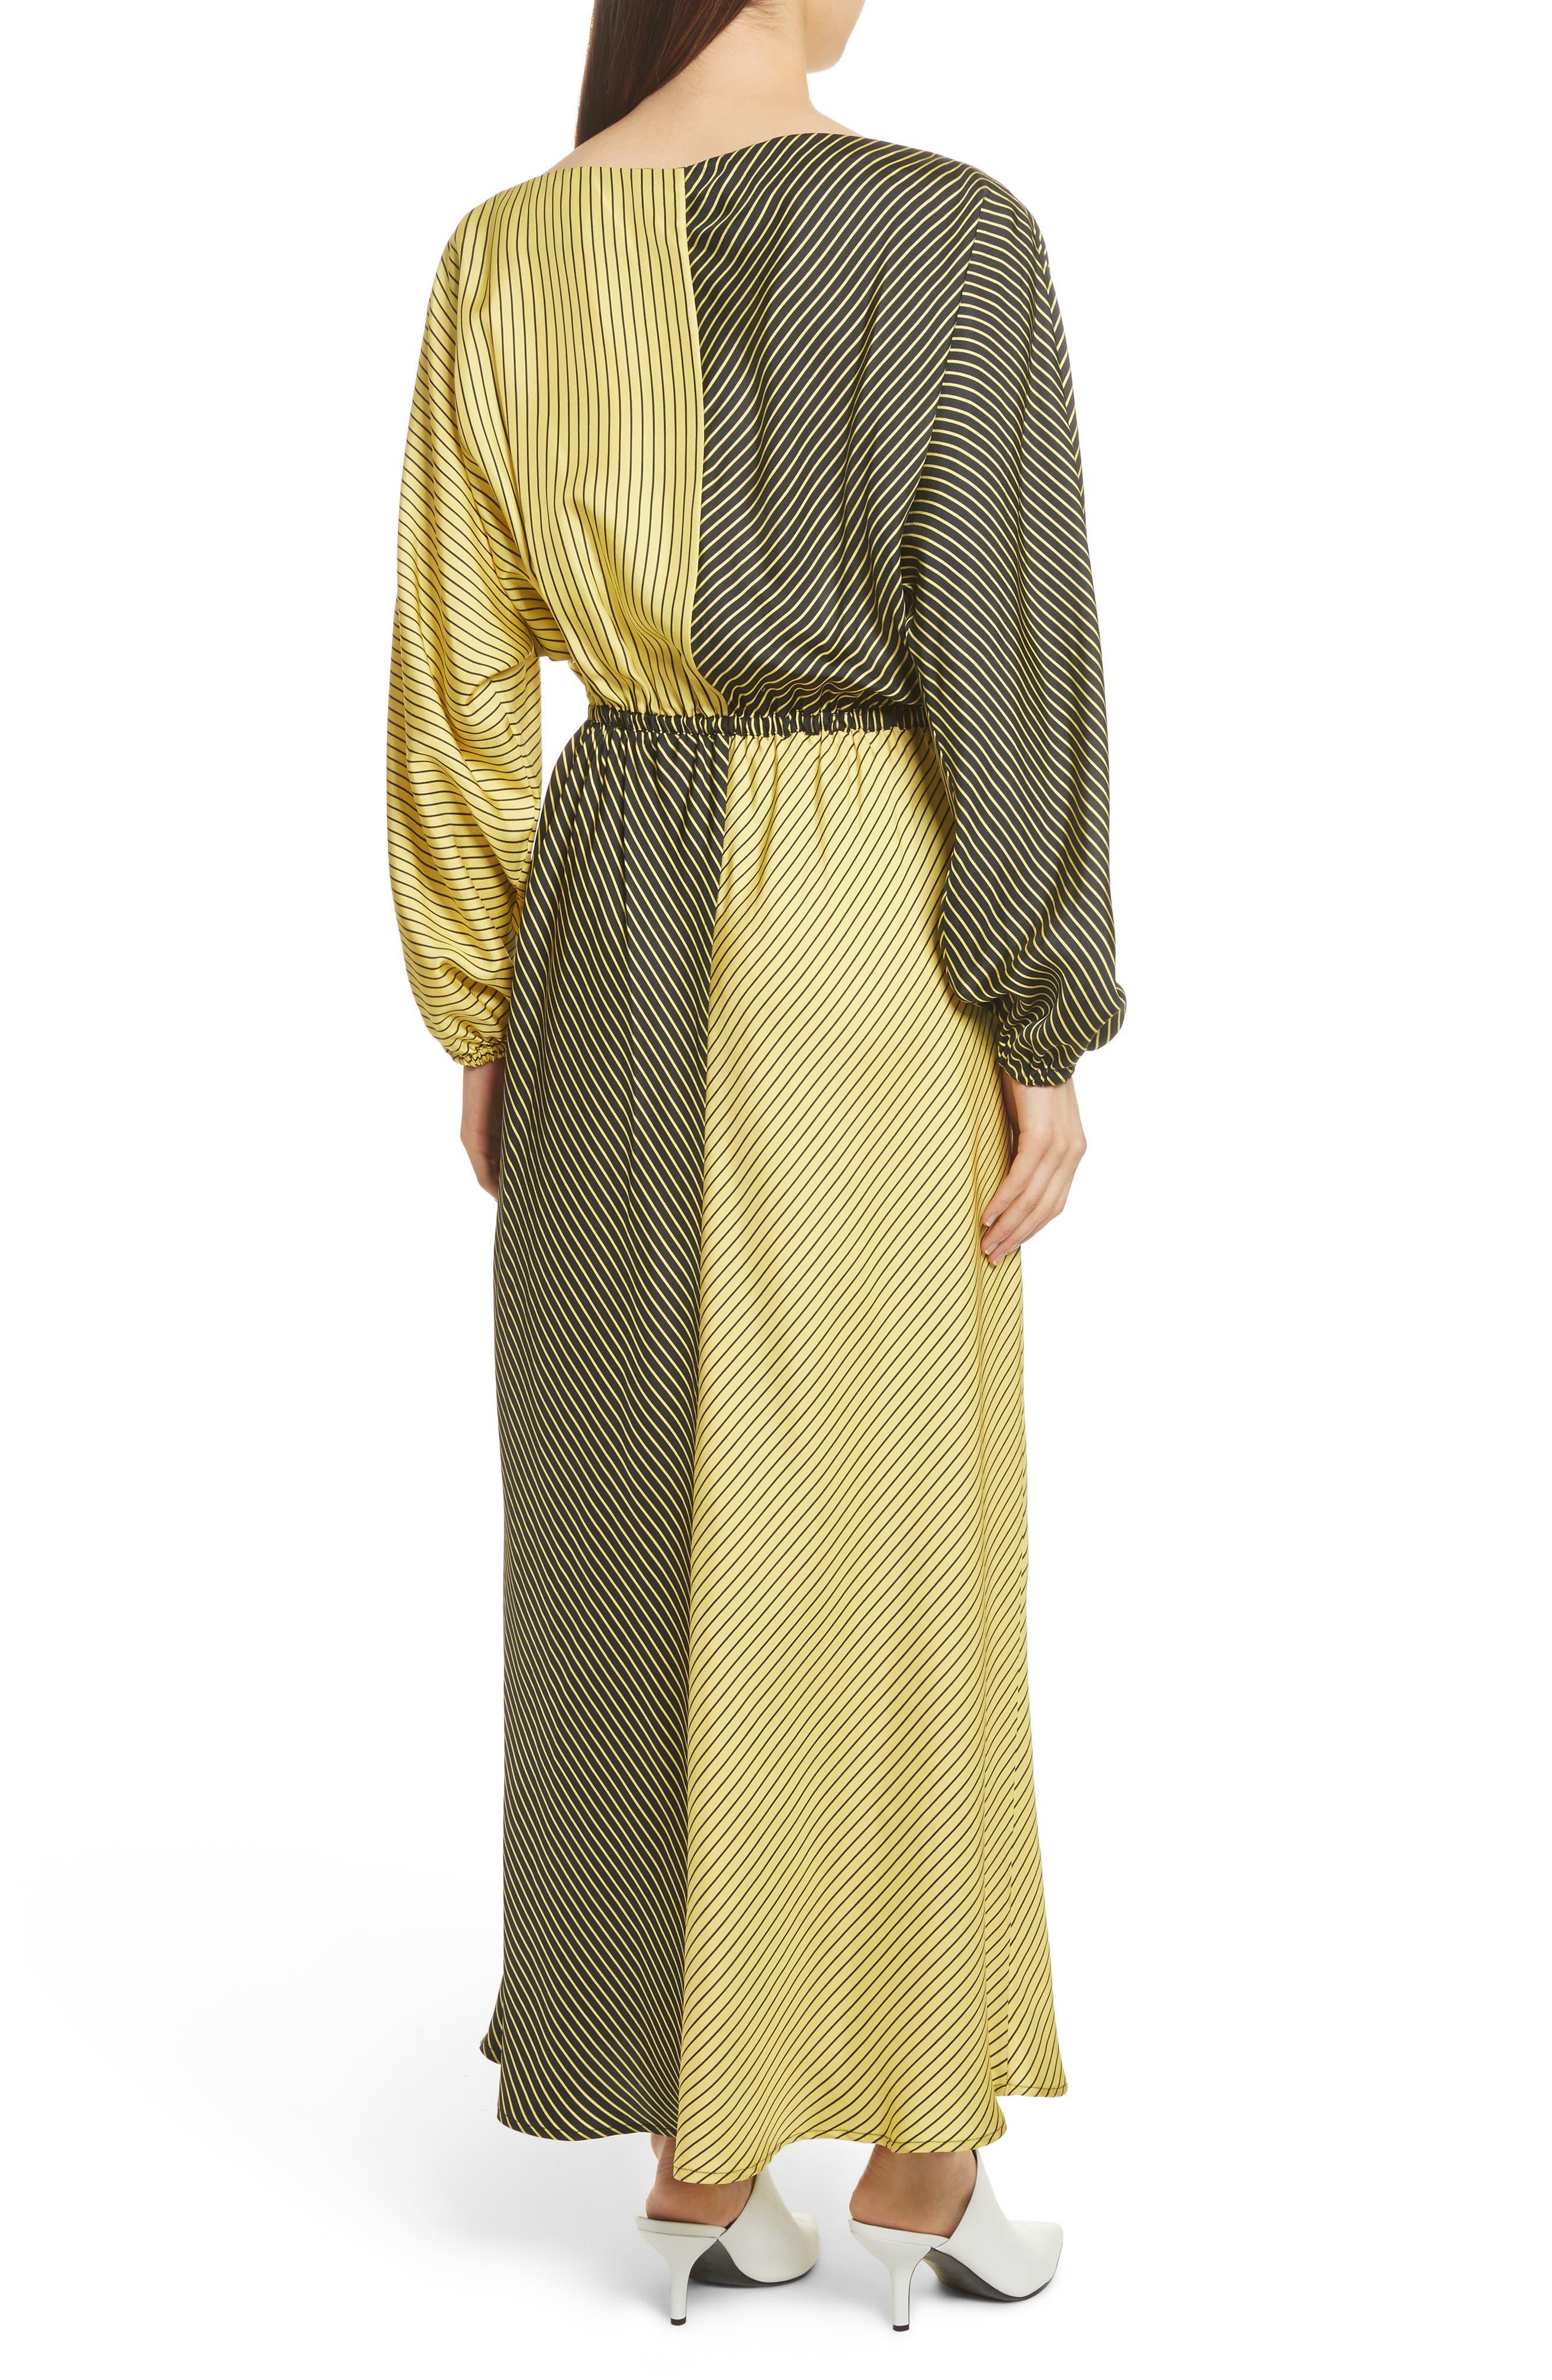 Colorblock Stripe Dress,                             Alternate thumbnail 3, color,                             Black/ Yellow